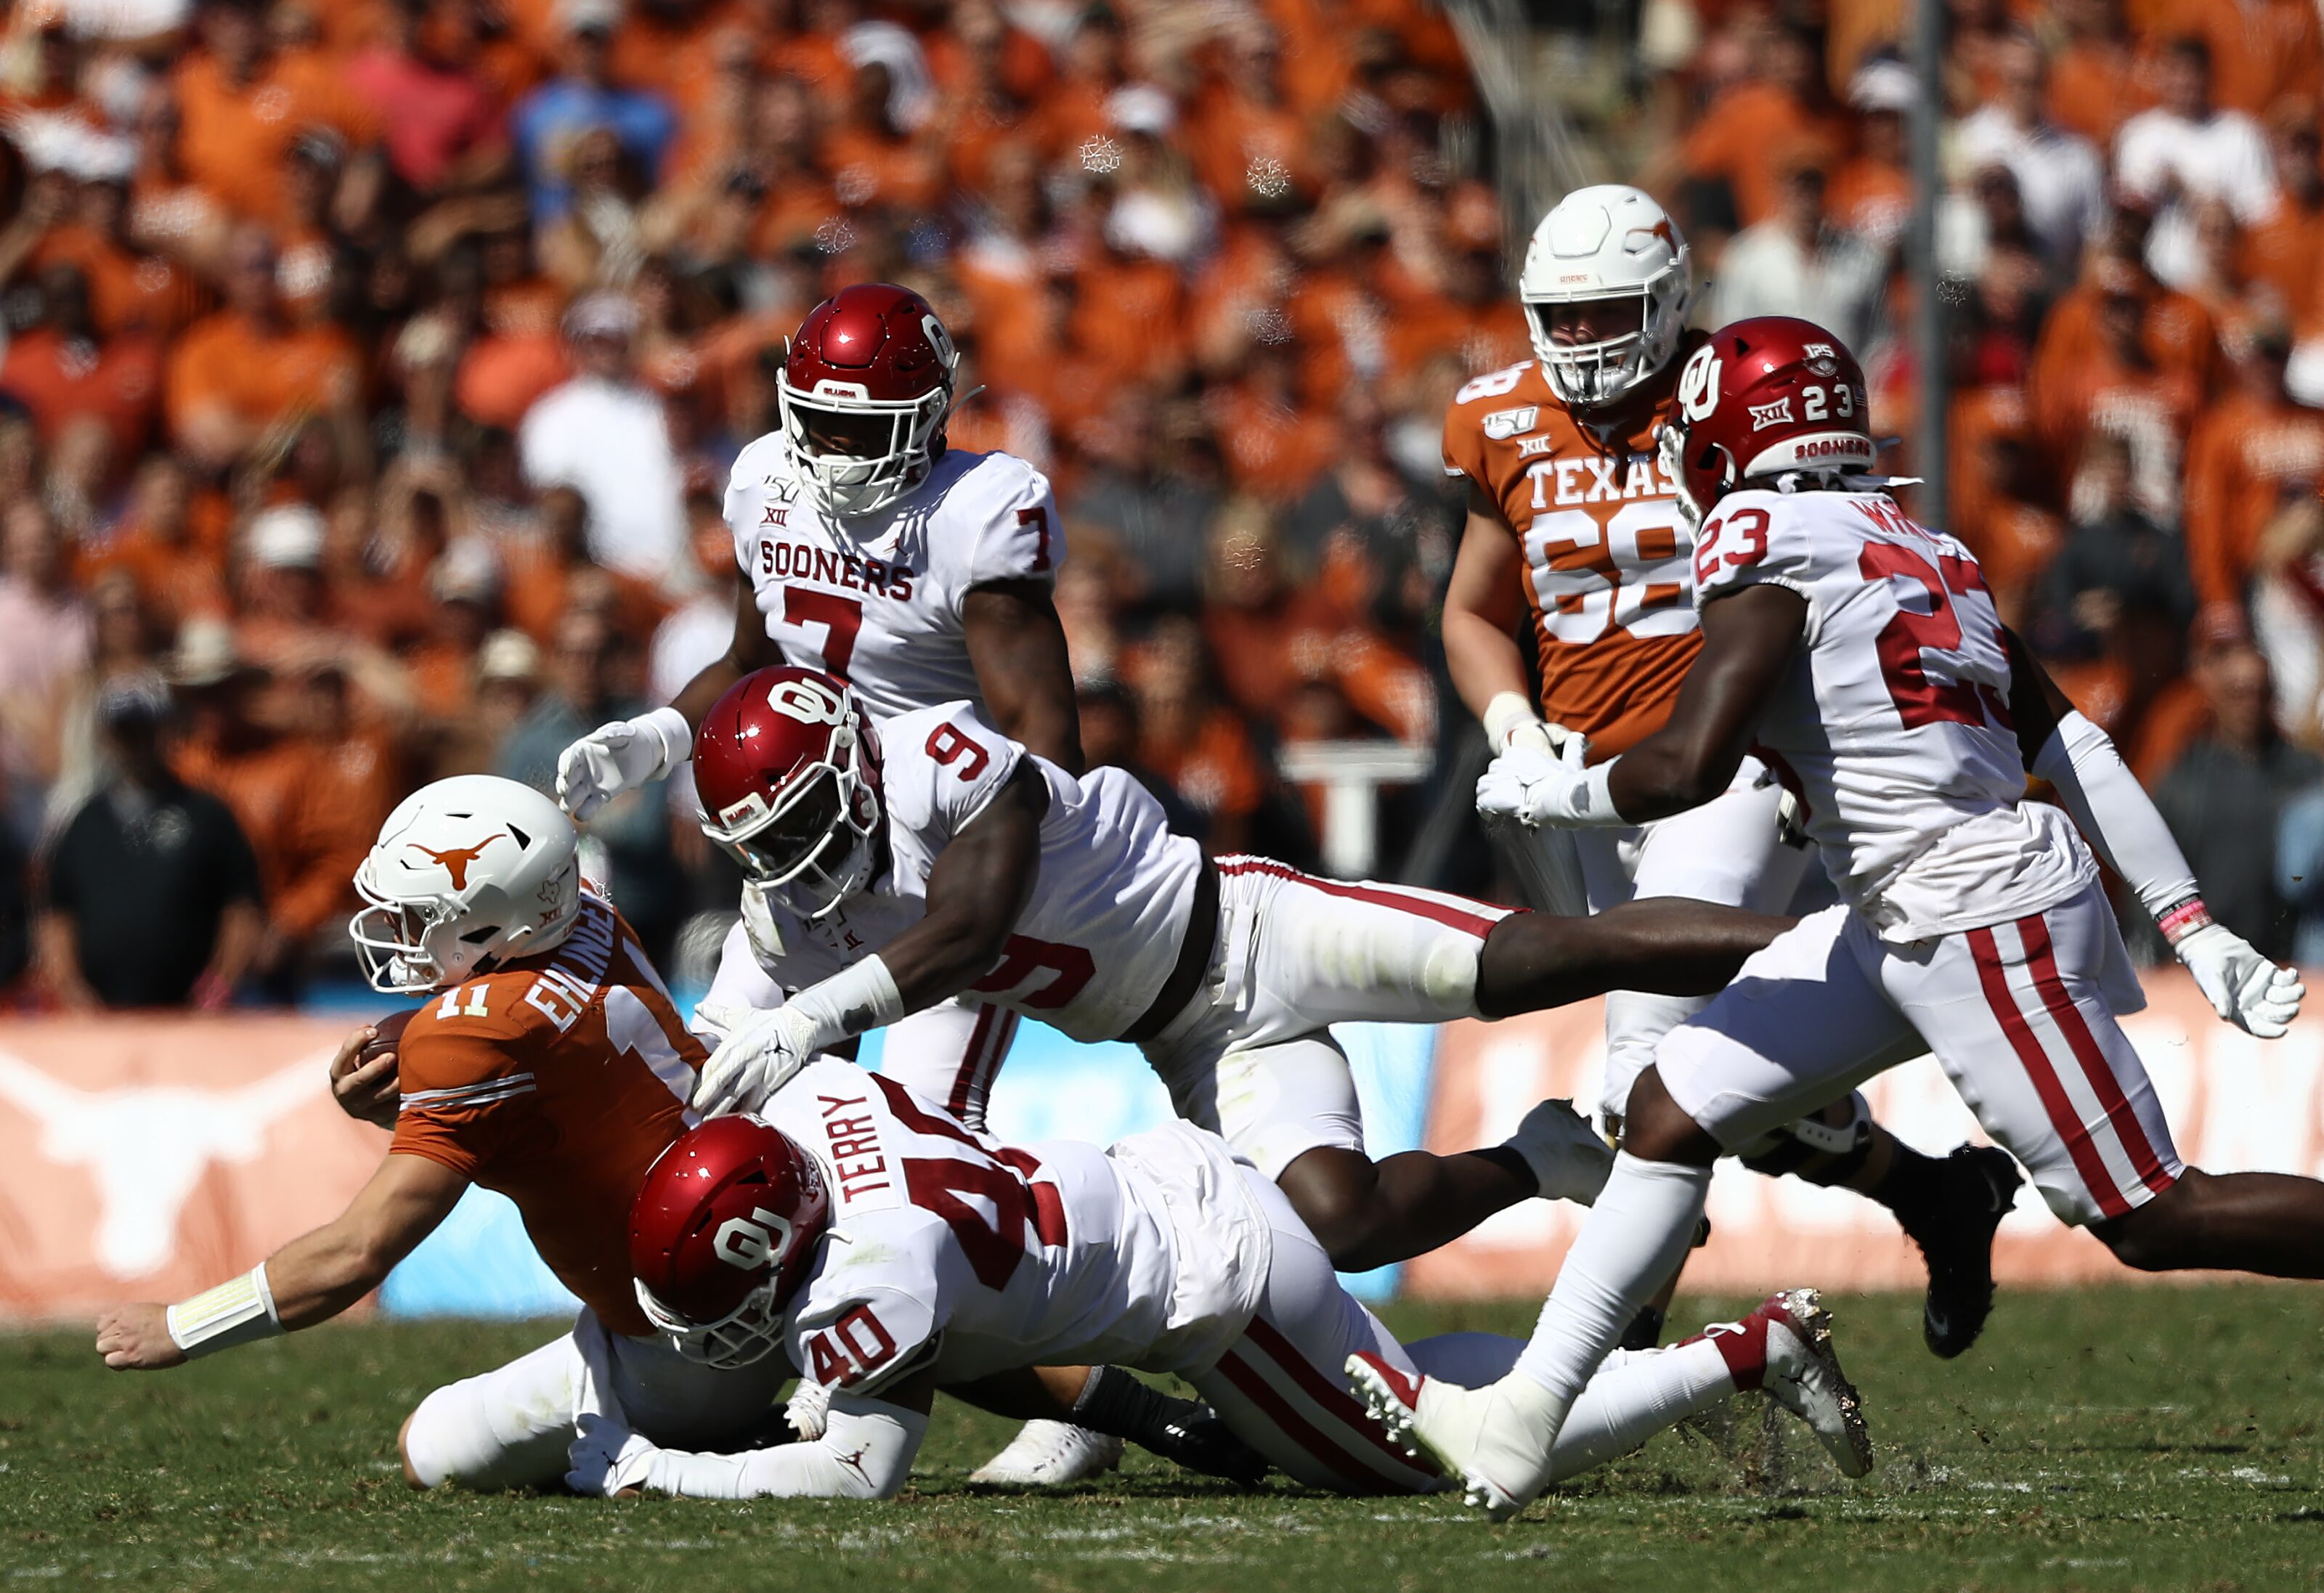 Oklahoma football: Sooner LB out for season